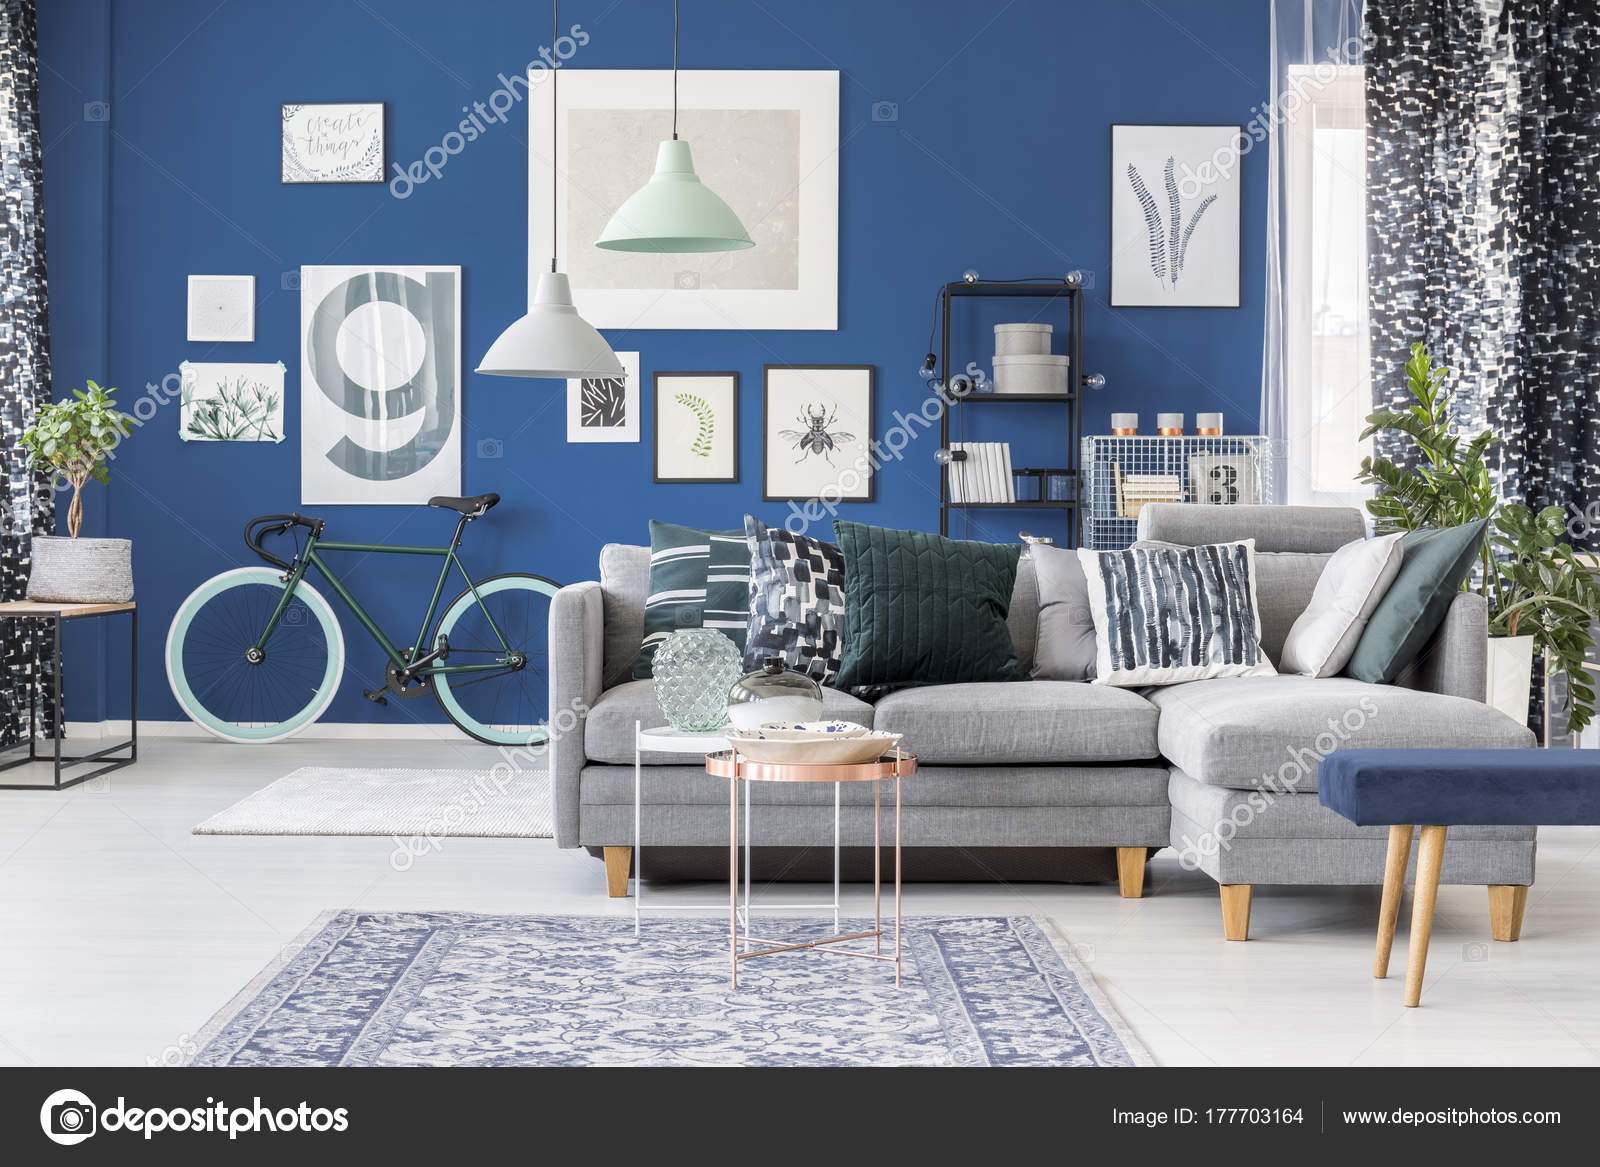 Blauen Wohnzimmer Stockfoto C Photographee Eu 177703164